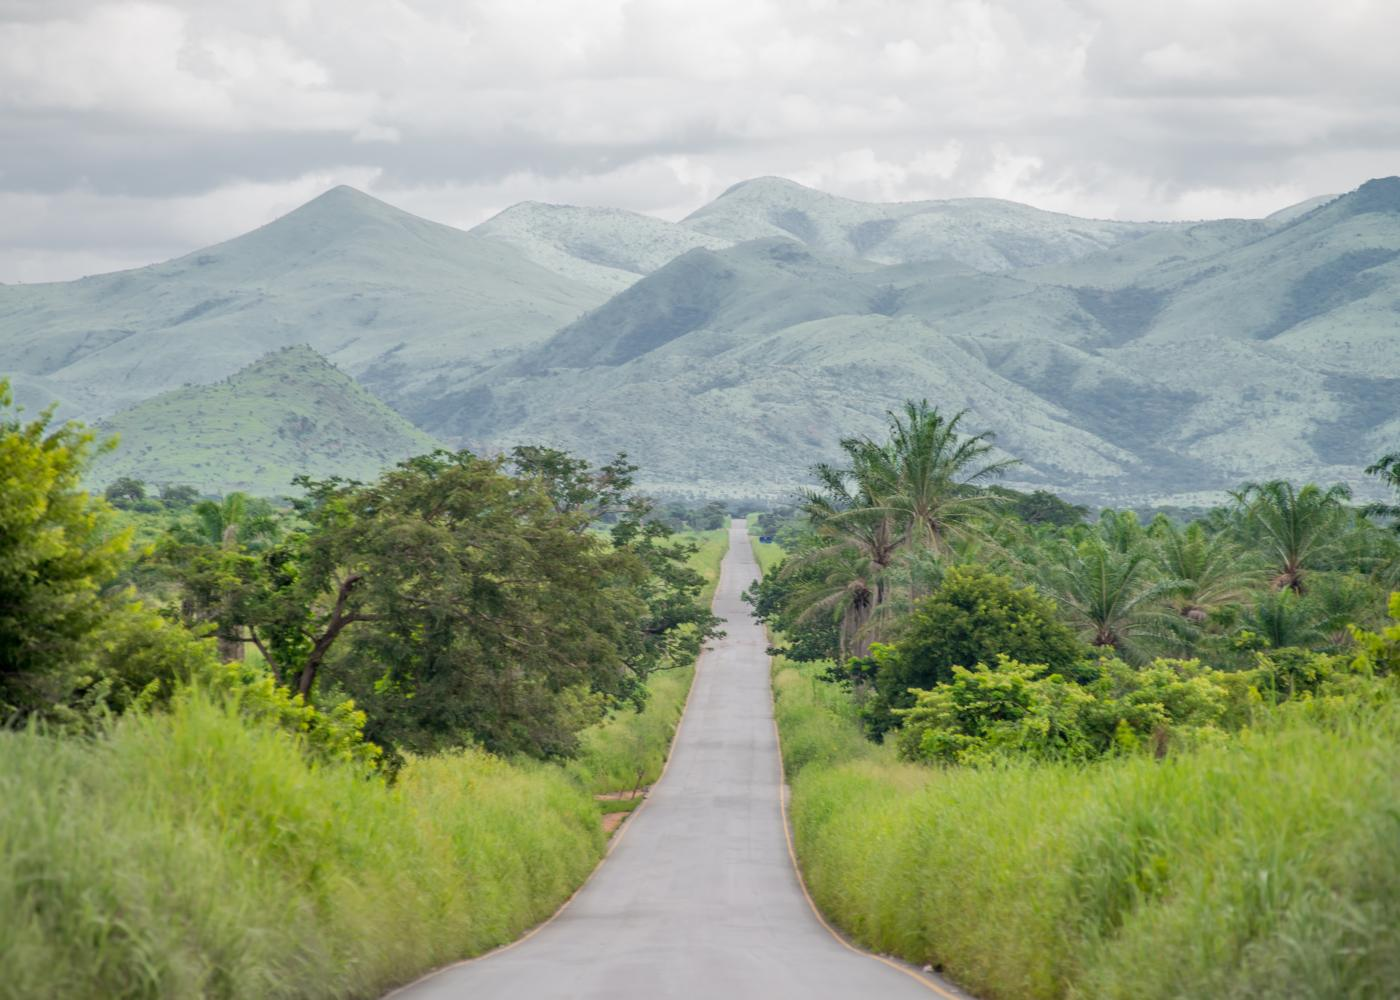 Estrada do Huambo